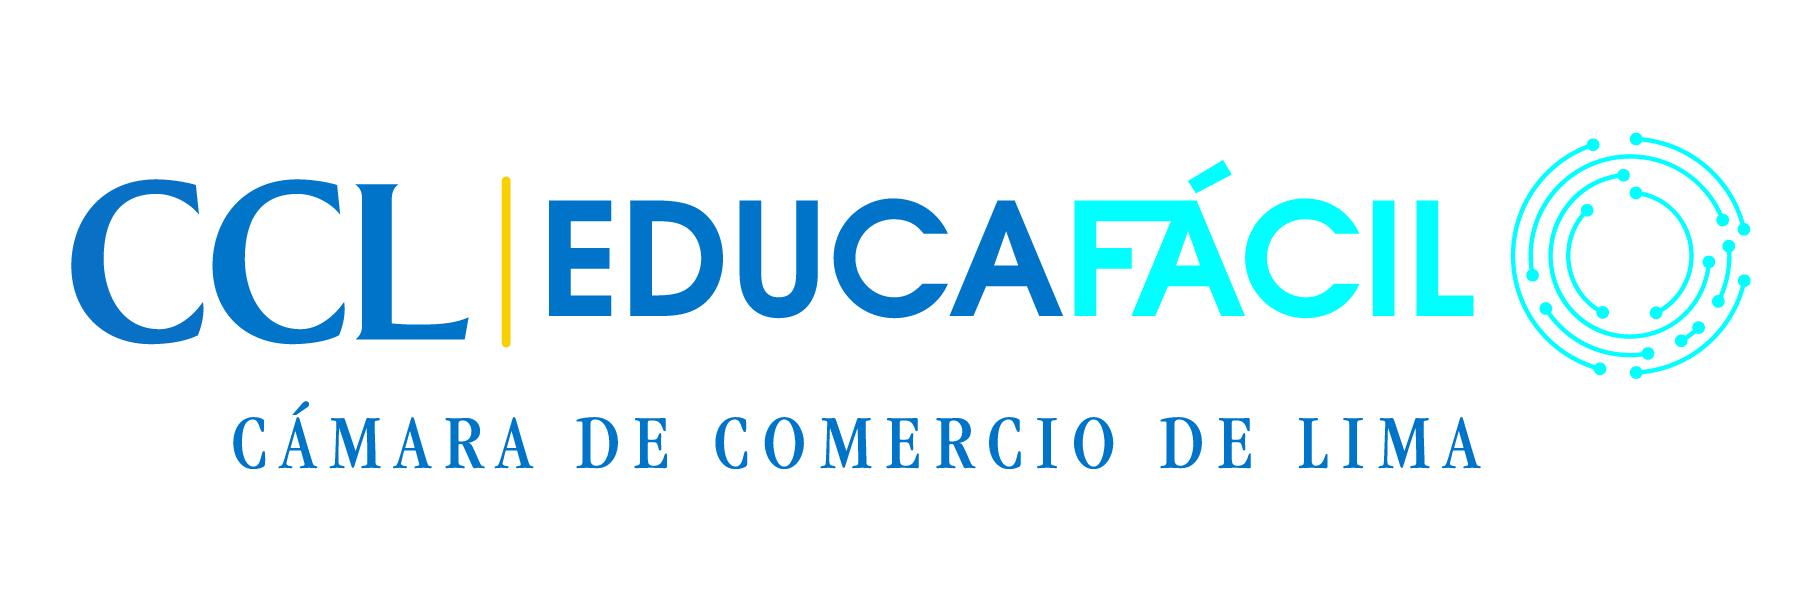 CCL EducaFacil